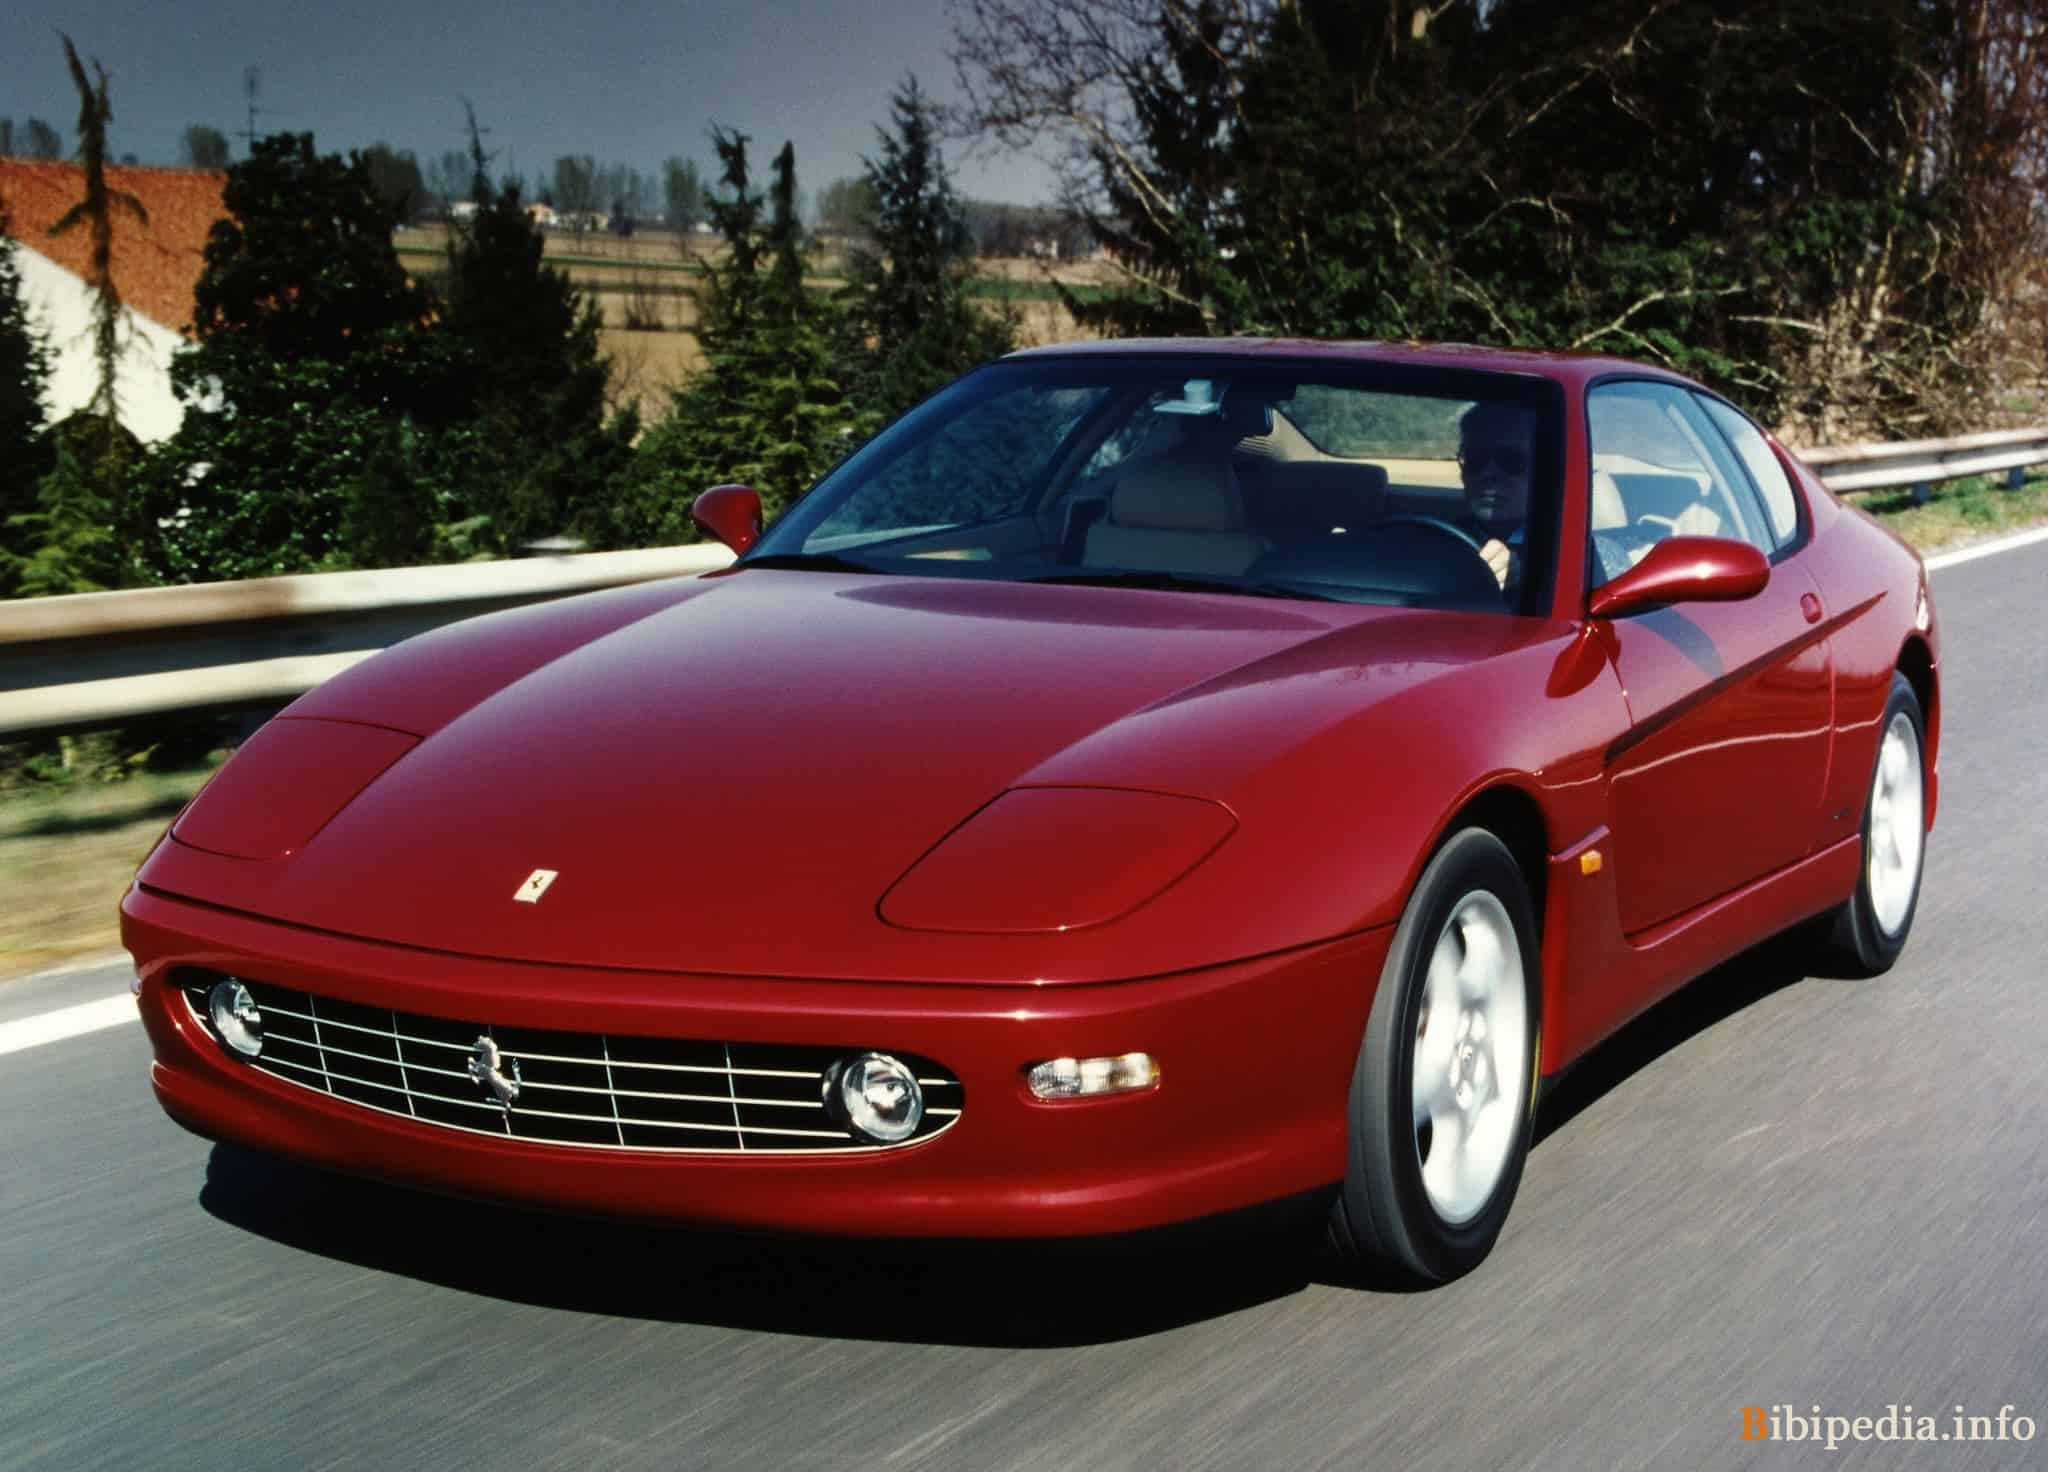 Ferrari 456 Best car to buy 2020